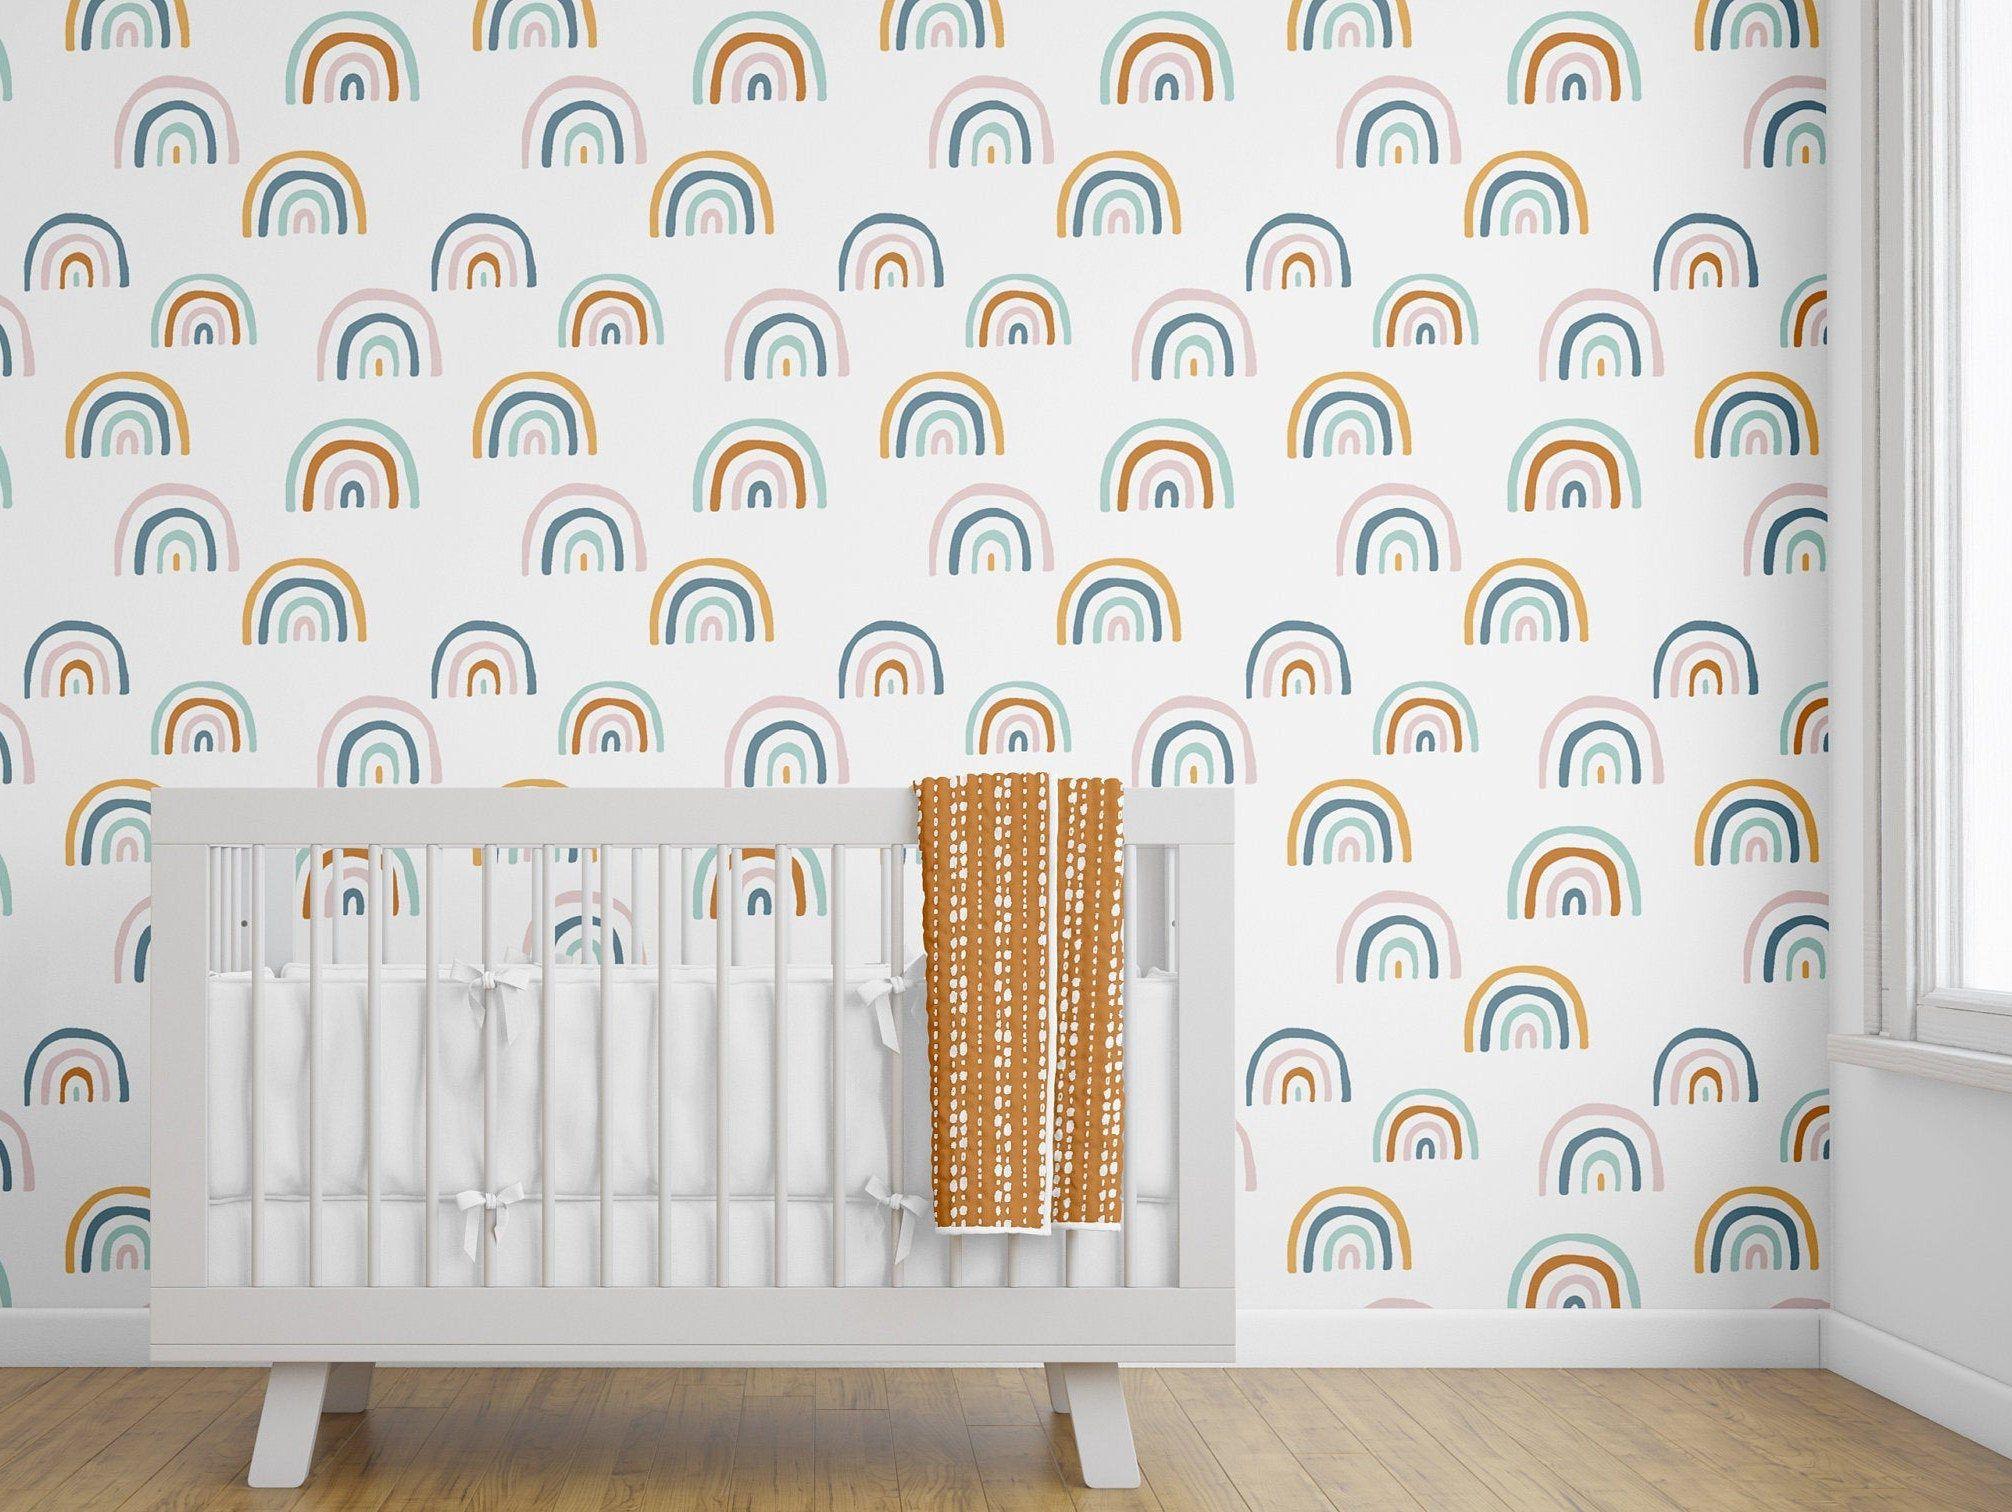 Removable Wallpaper Rainbow Wallpaper Peel And Stick Boho Etsy Rainbow Room Decor Rainbow Wallpaper Boho Wallpaper